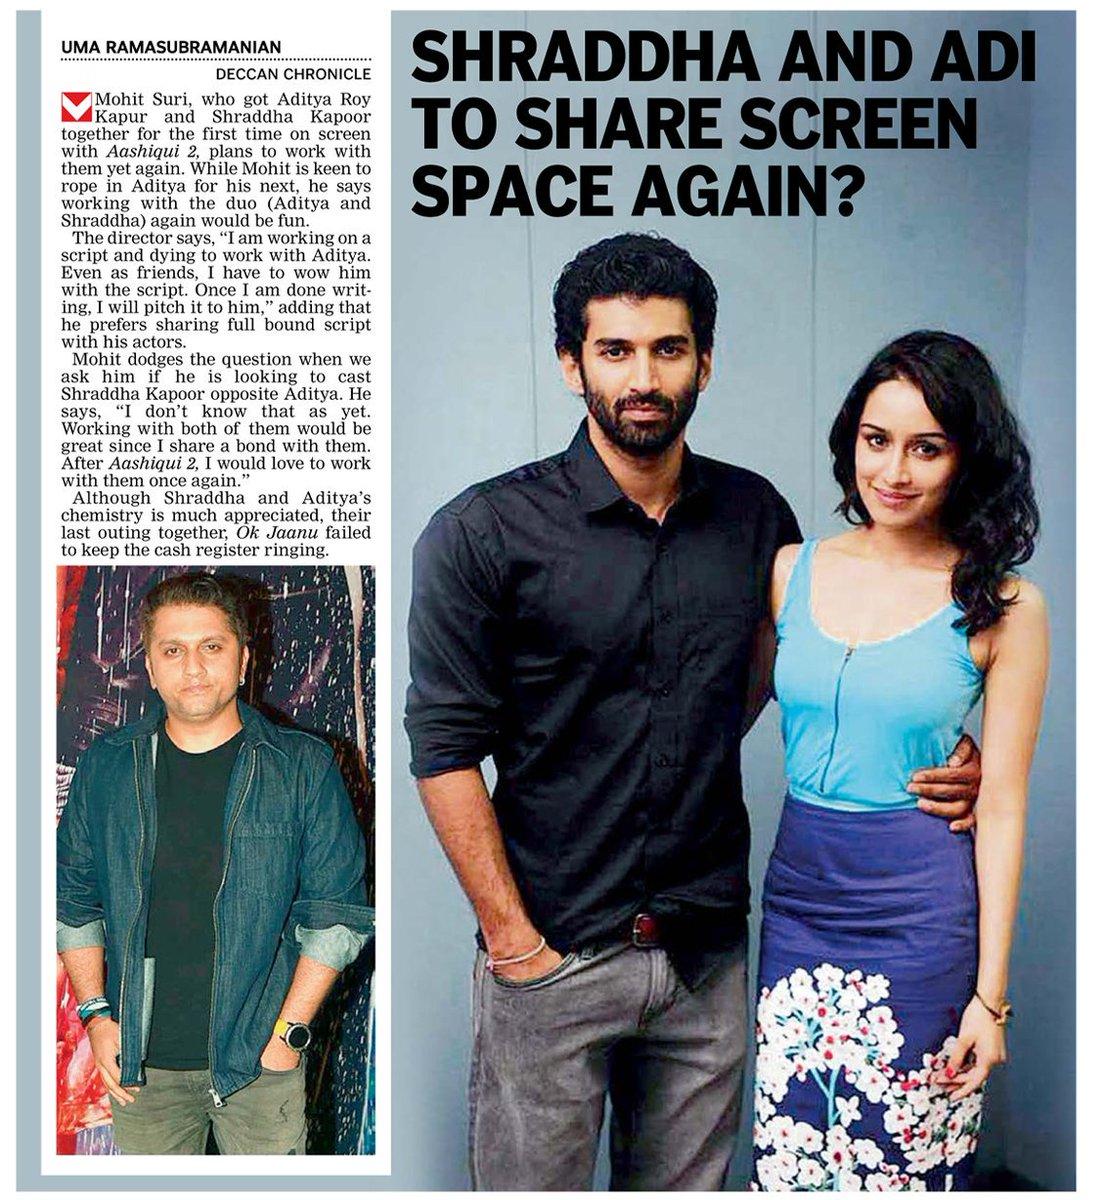 [SCAN]: @ShraddhaKapoor & Aditya To Share Screen Space Again?